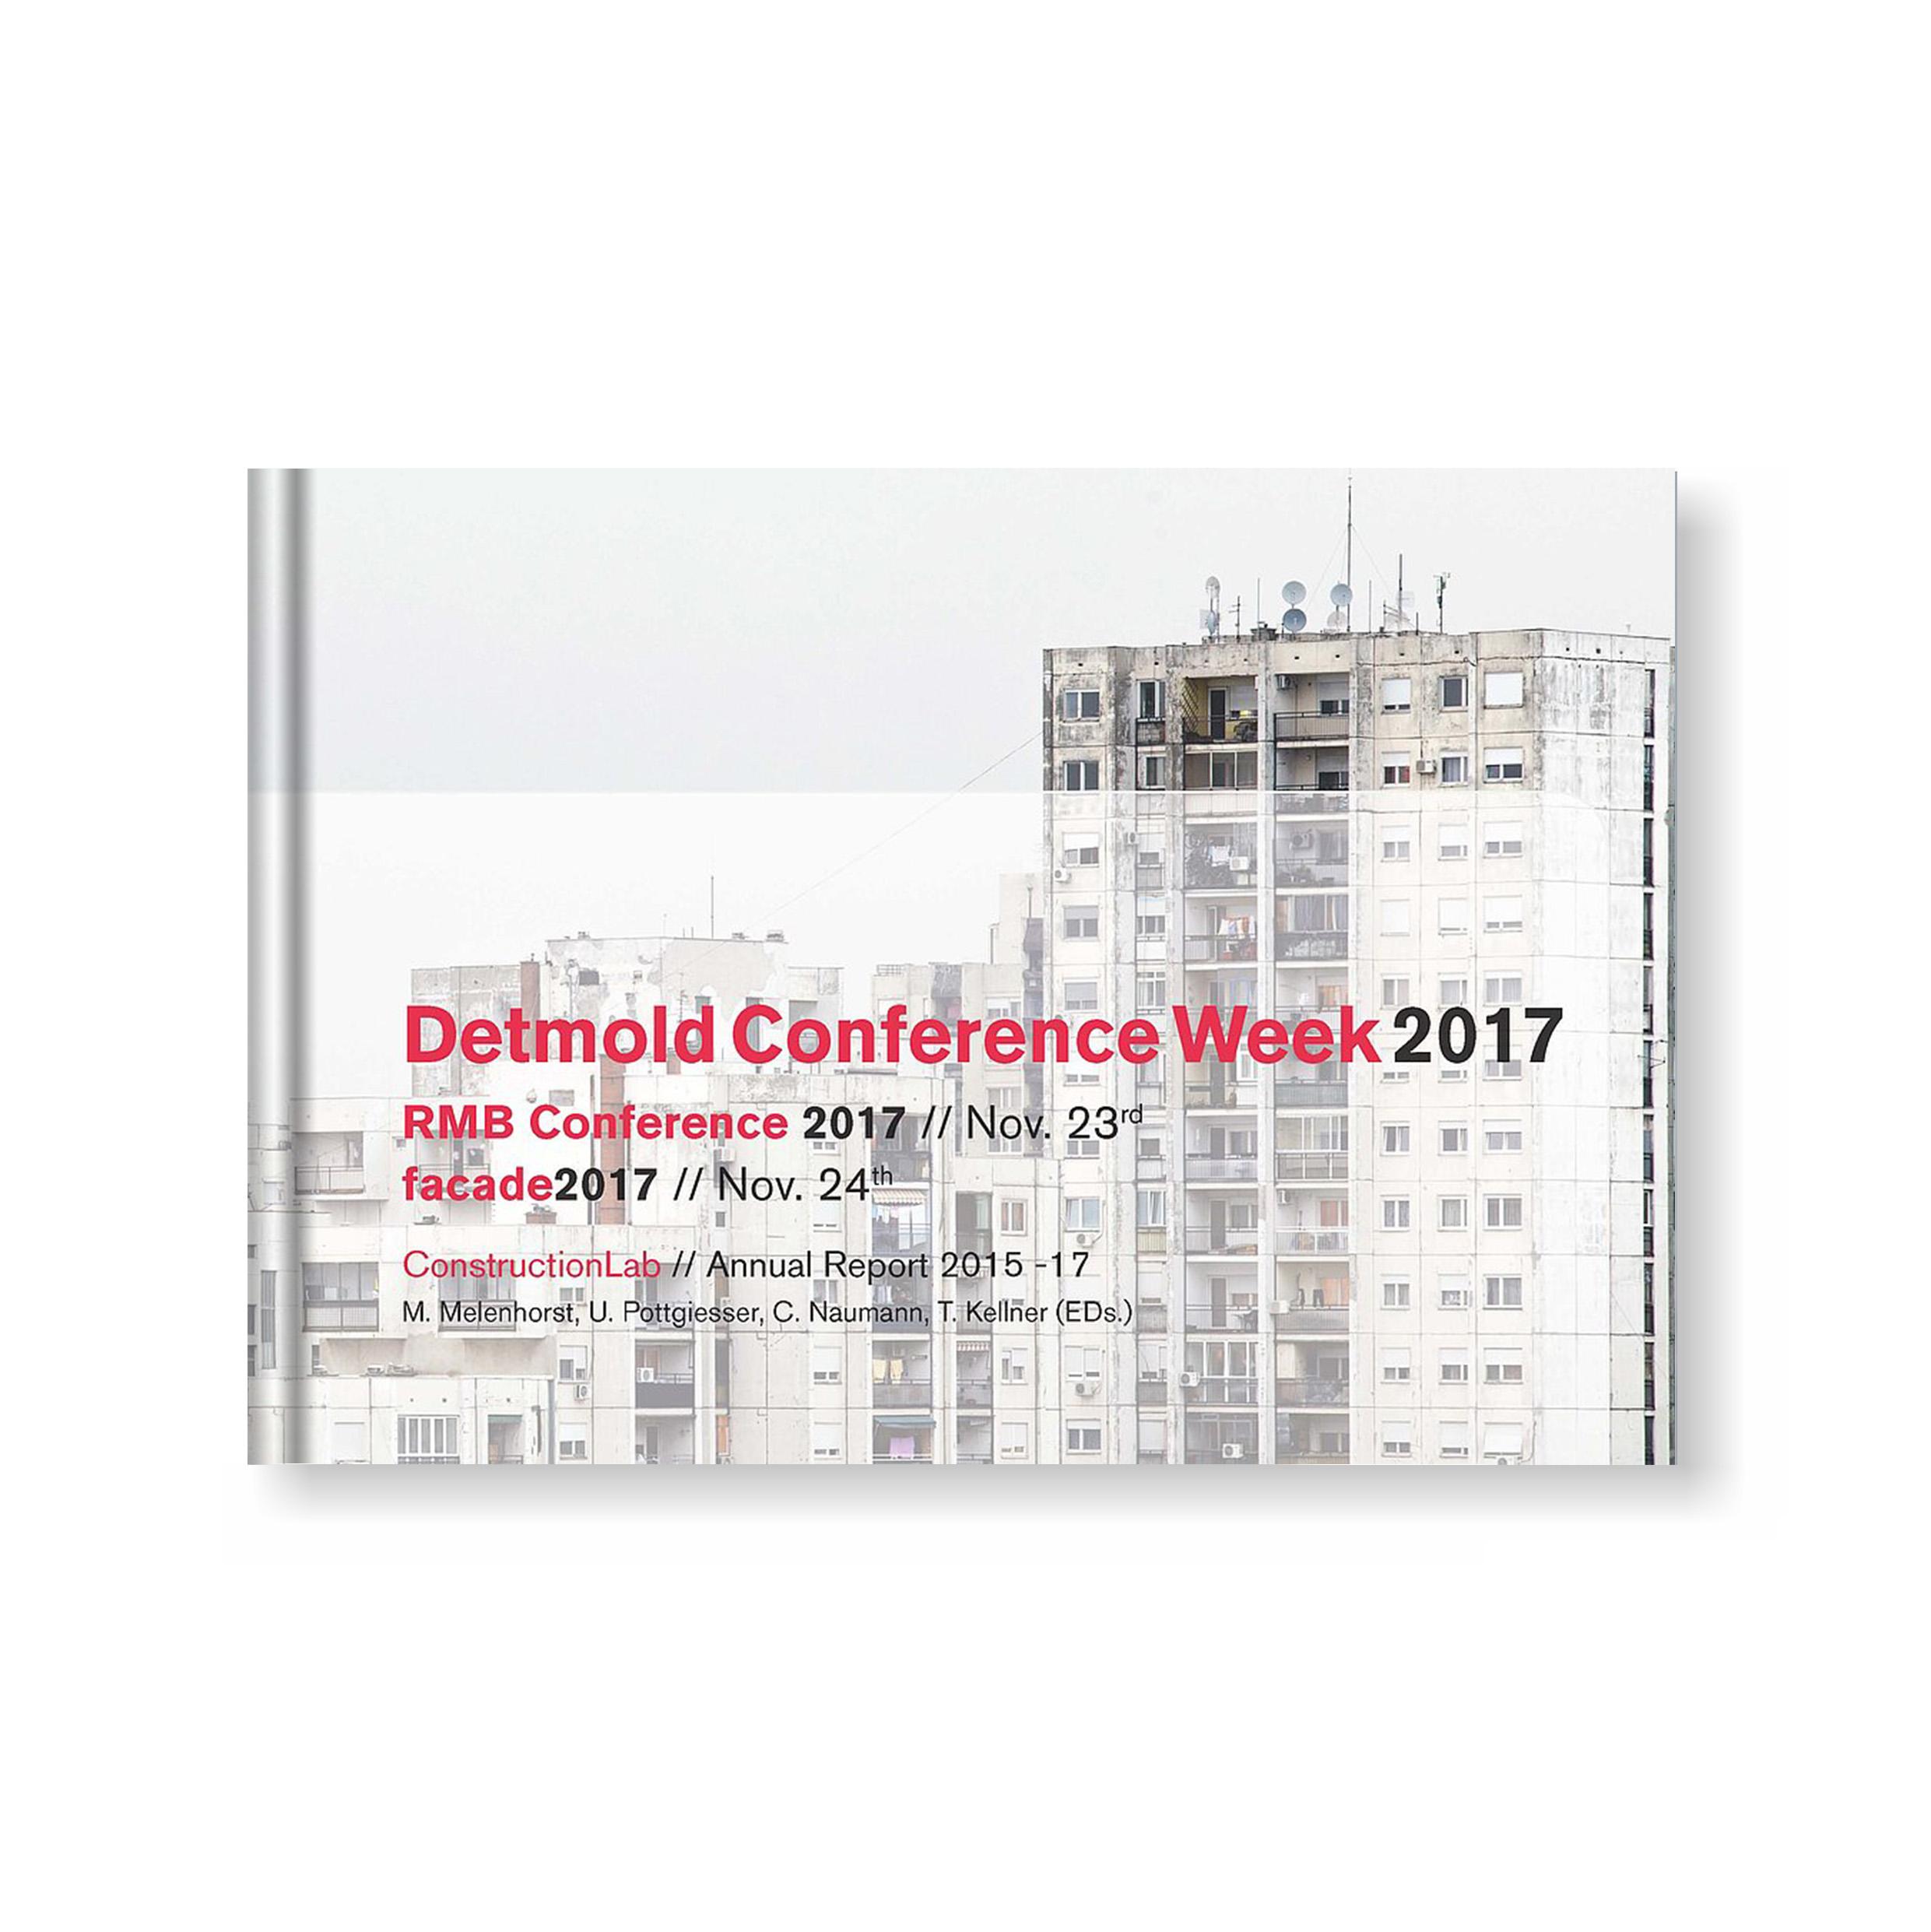 RMB Conference // facade2017